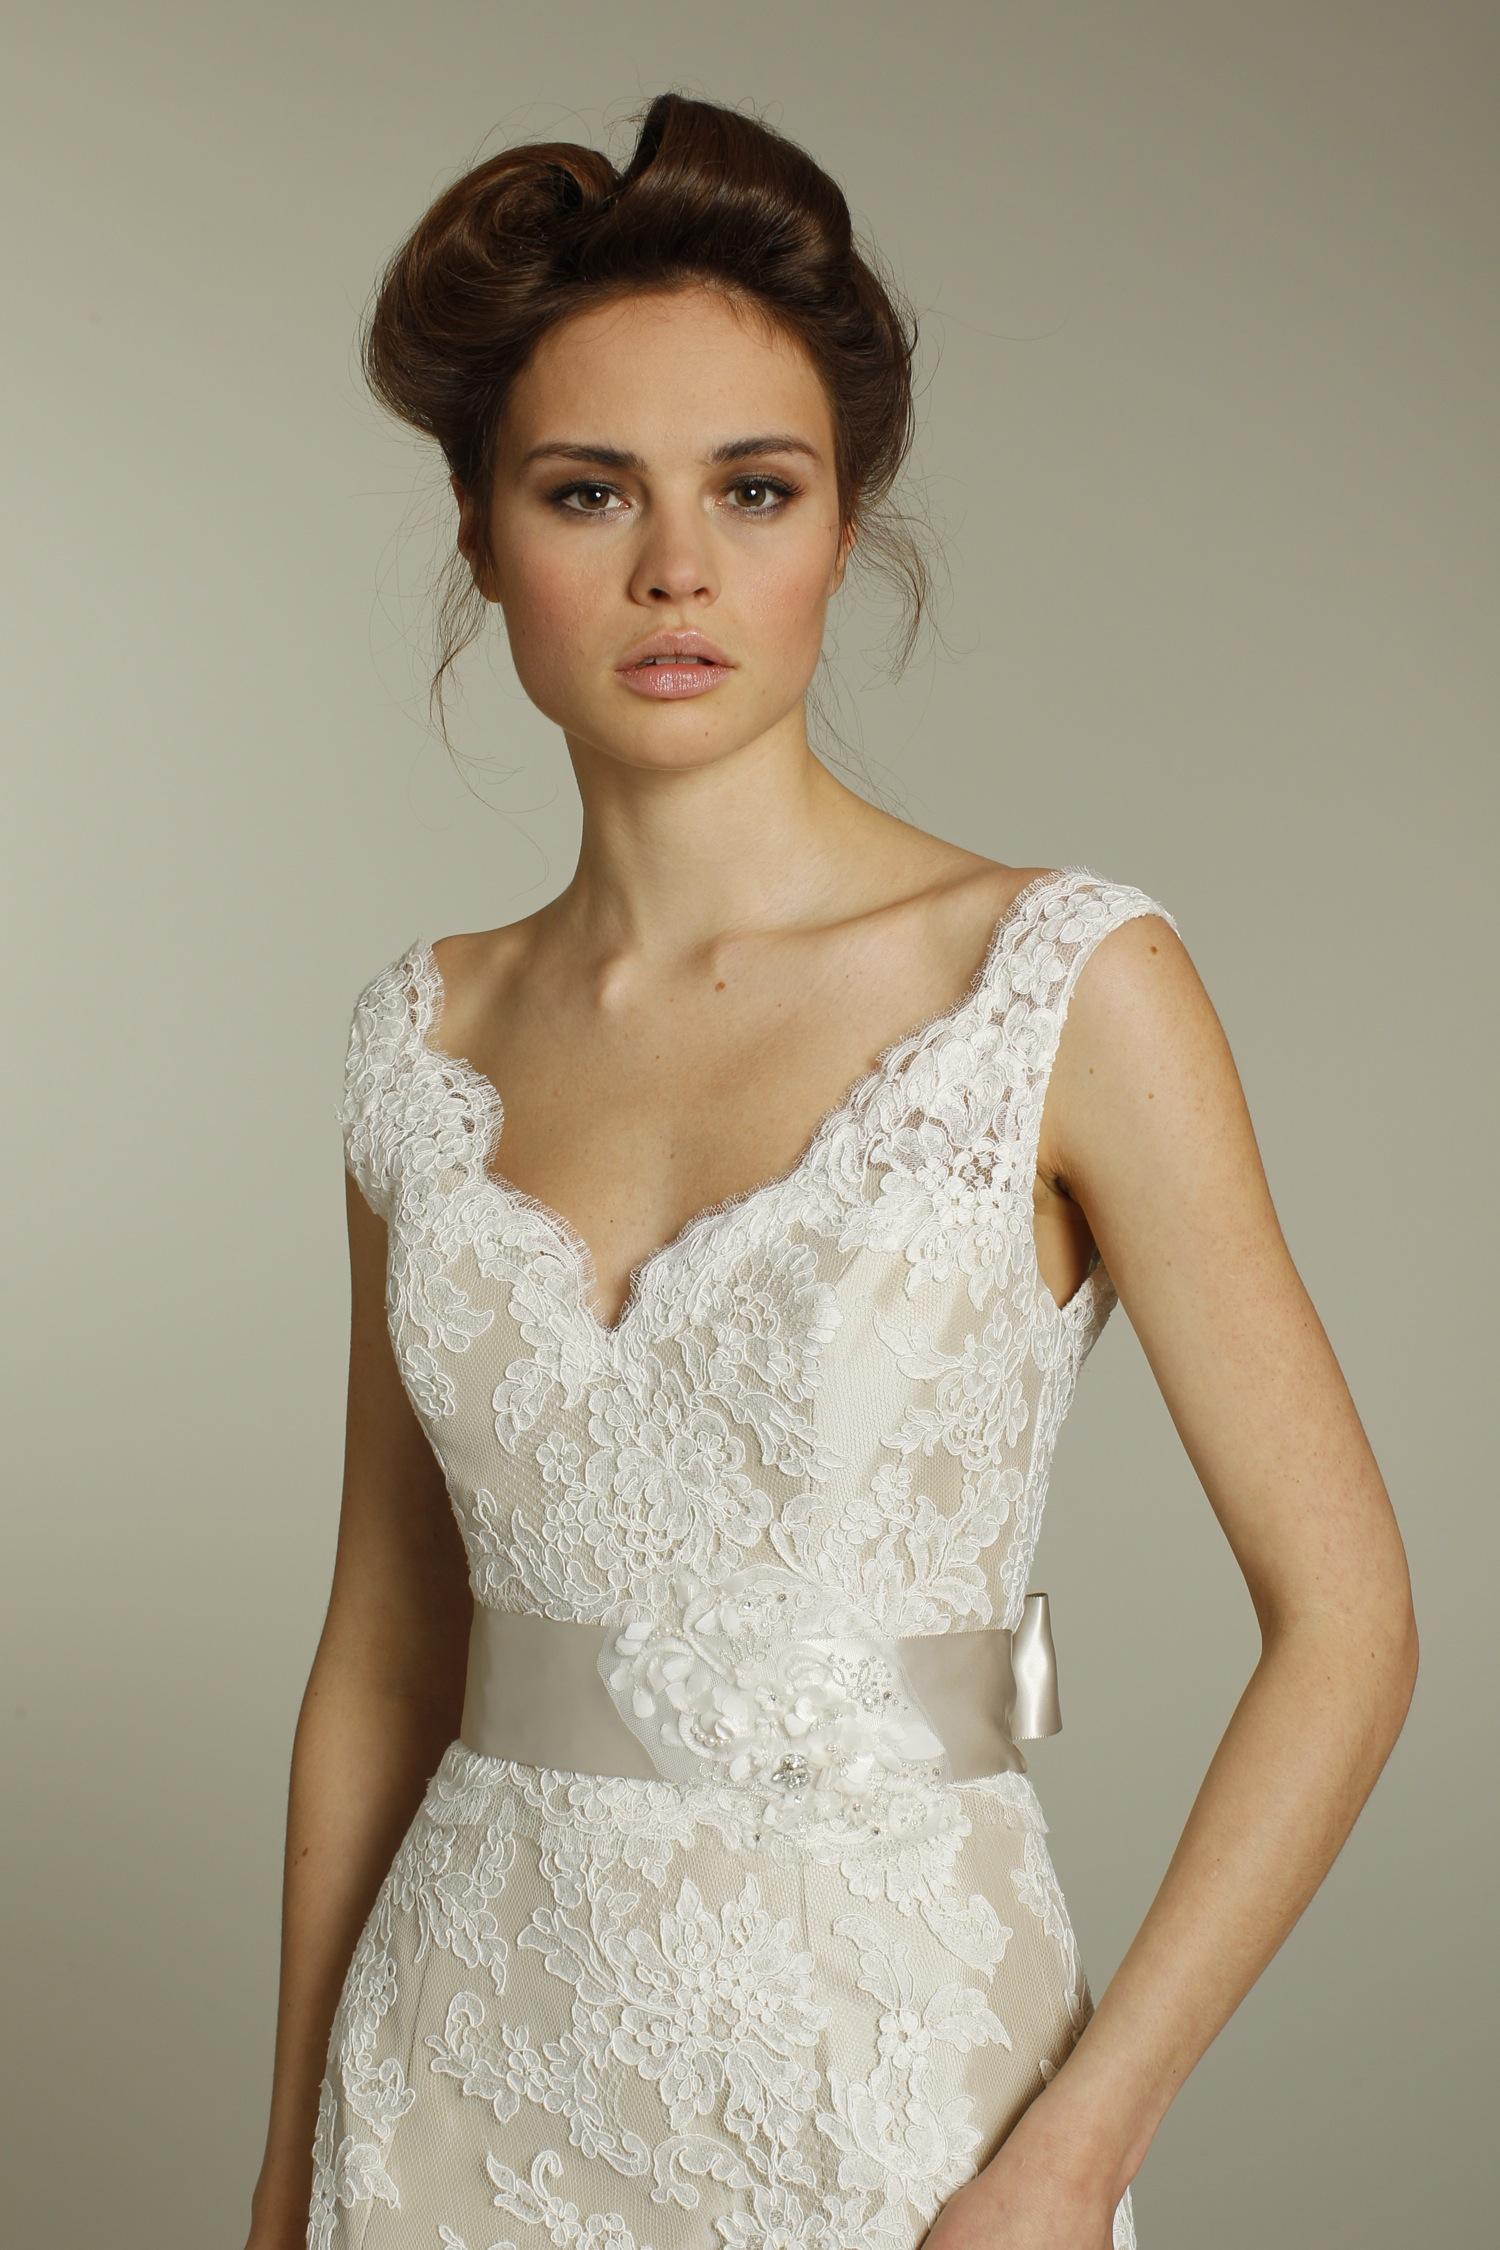 Champagne and ivory wedding dress  Galen DuAmato damato on Pinterest